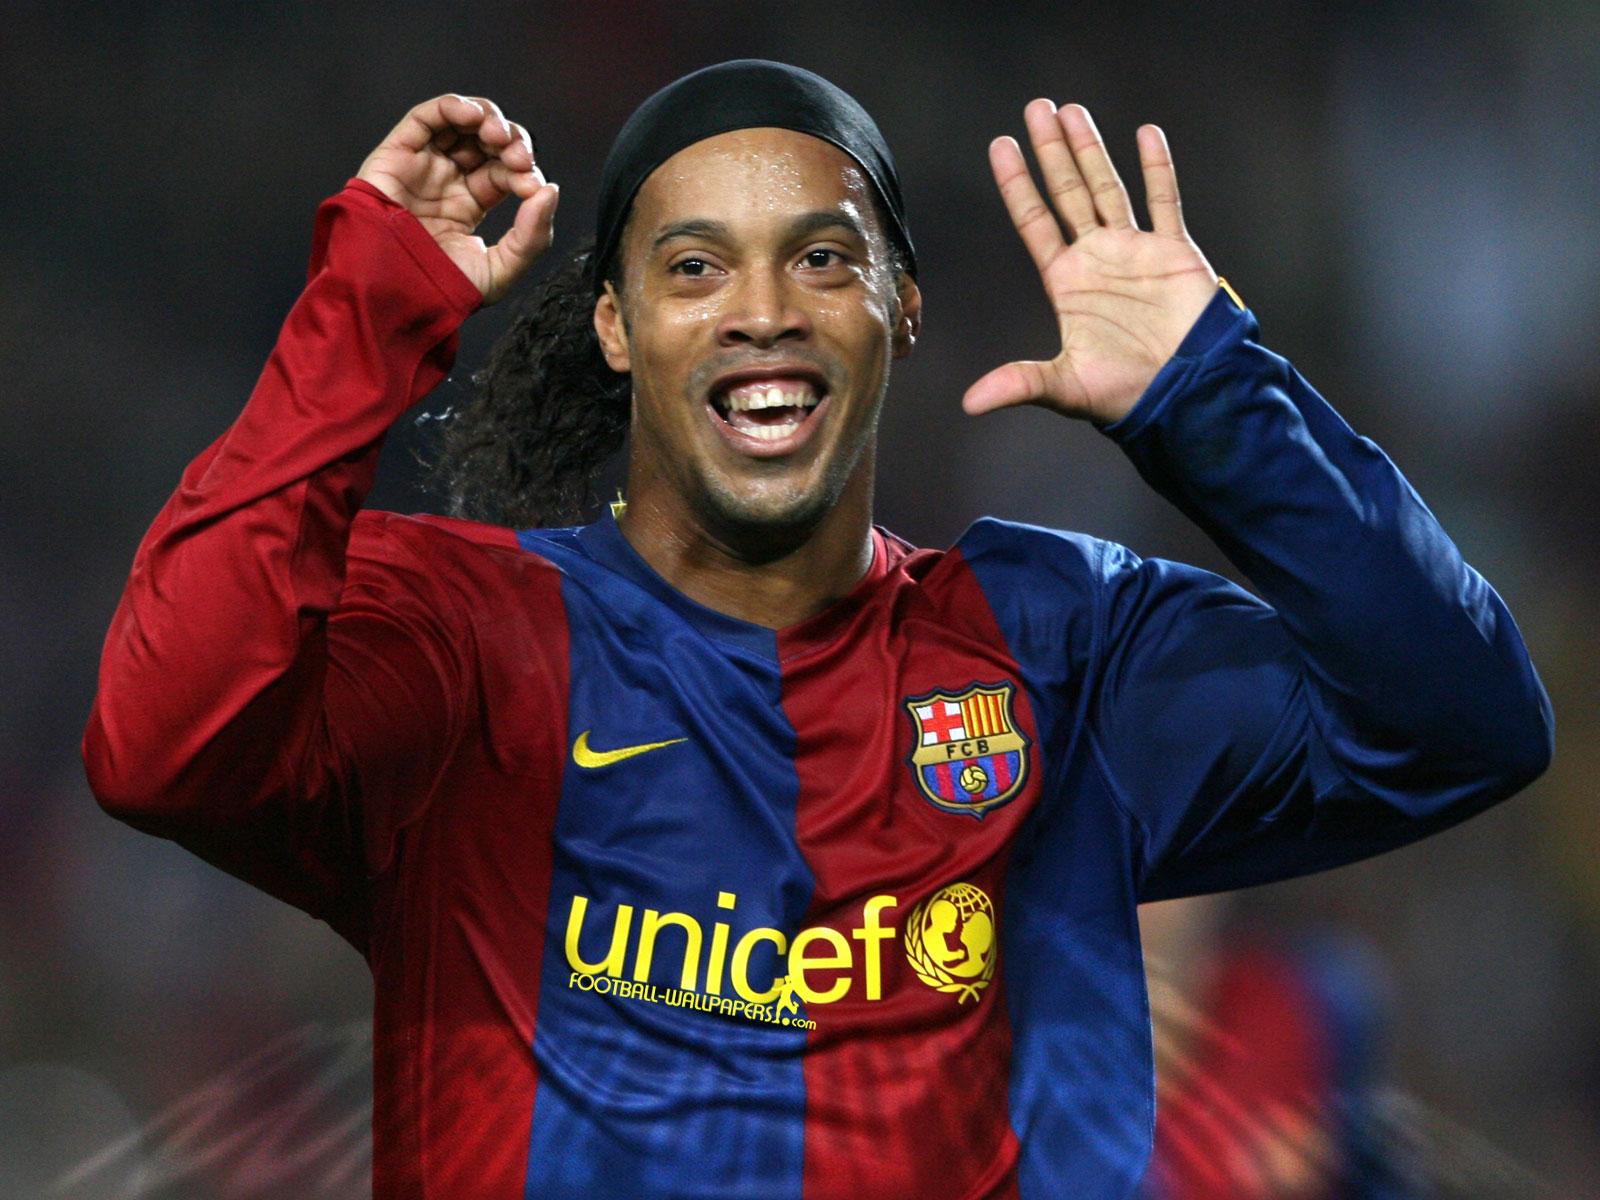 Awesome Ronaldinho Hd Wallpaper Free Download 1600x1200 Download Hd Wallpaper Wallpapertip